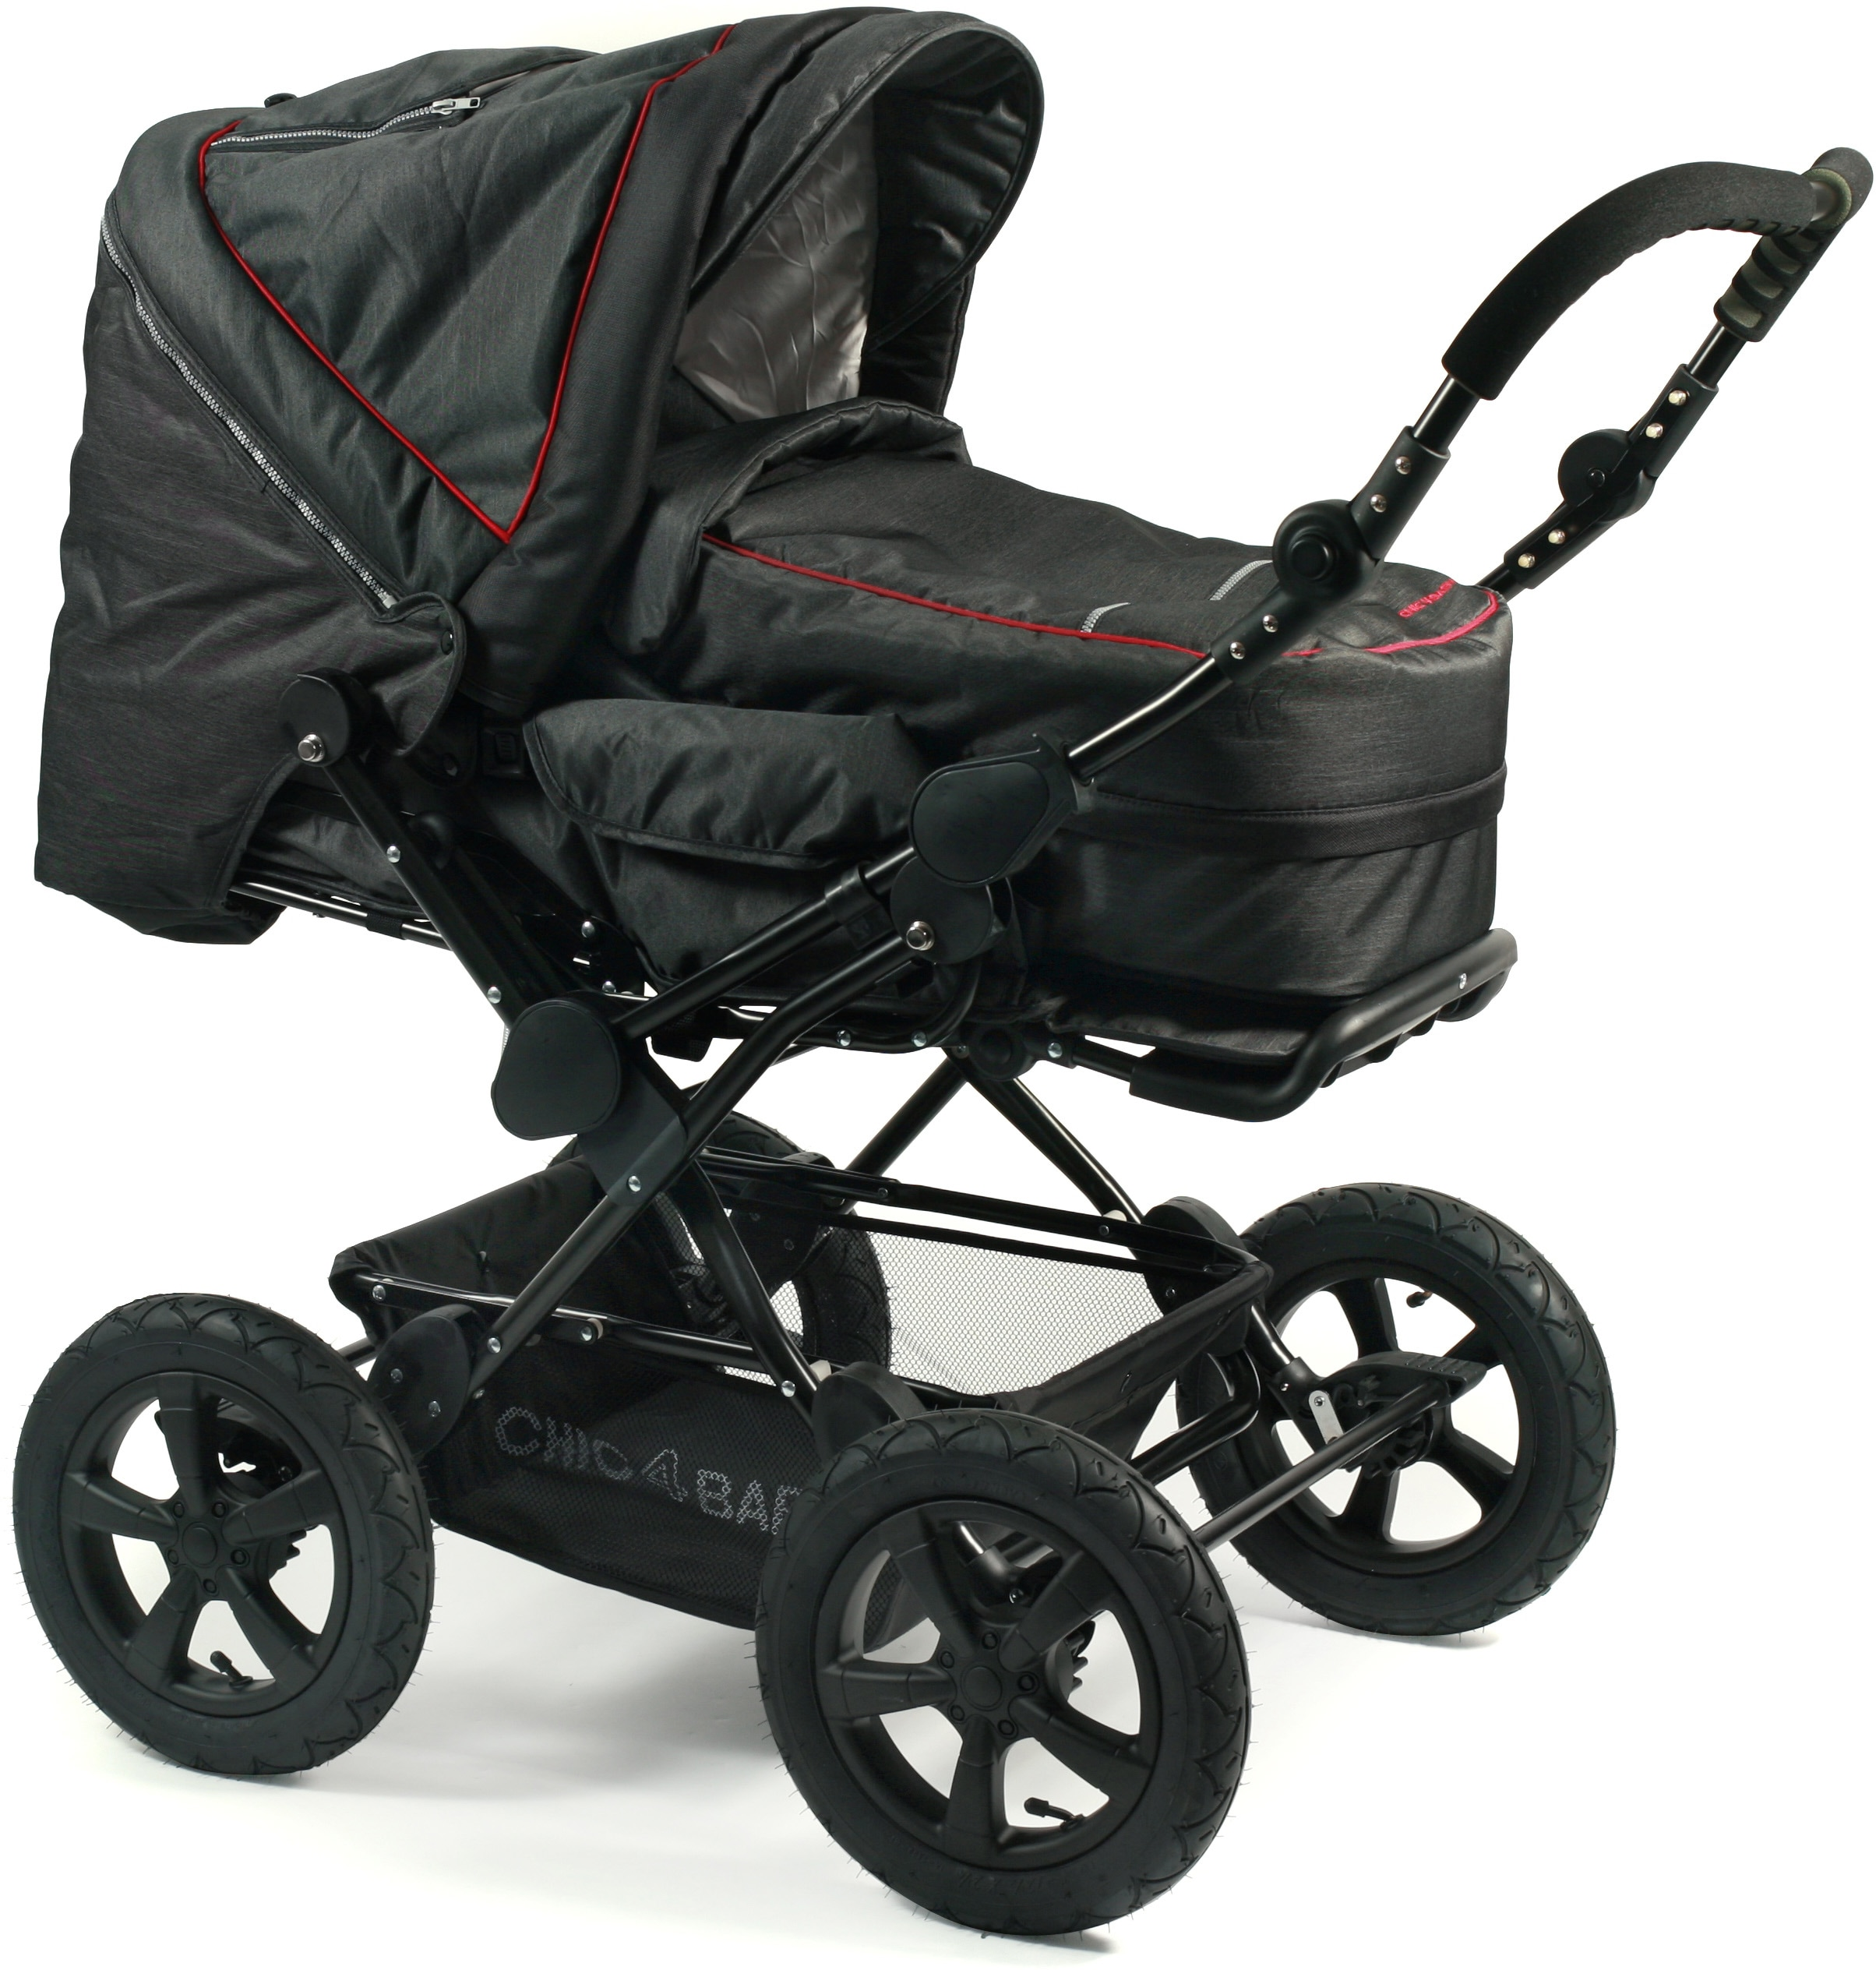 rabatt chic 4 baby kombi kinderwagen viva jeans black schwarz. Black Bedroom Furniture Sets. Home Design Ideas